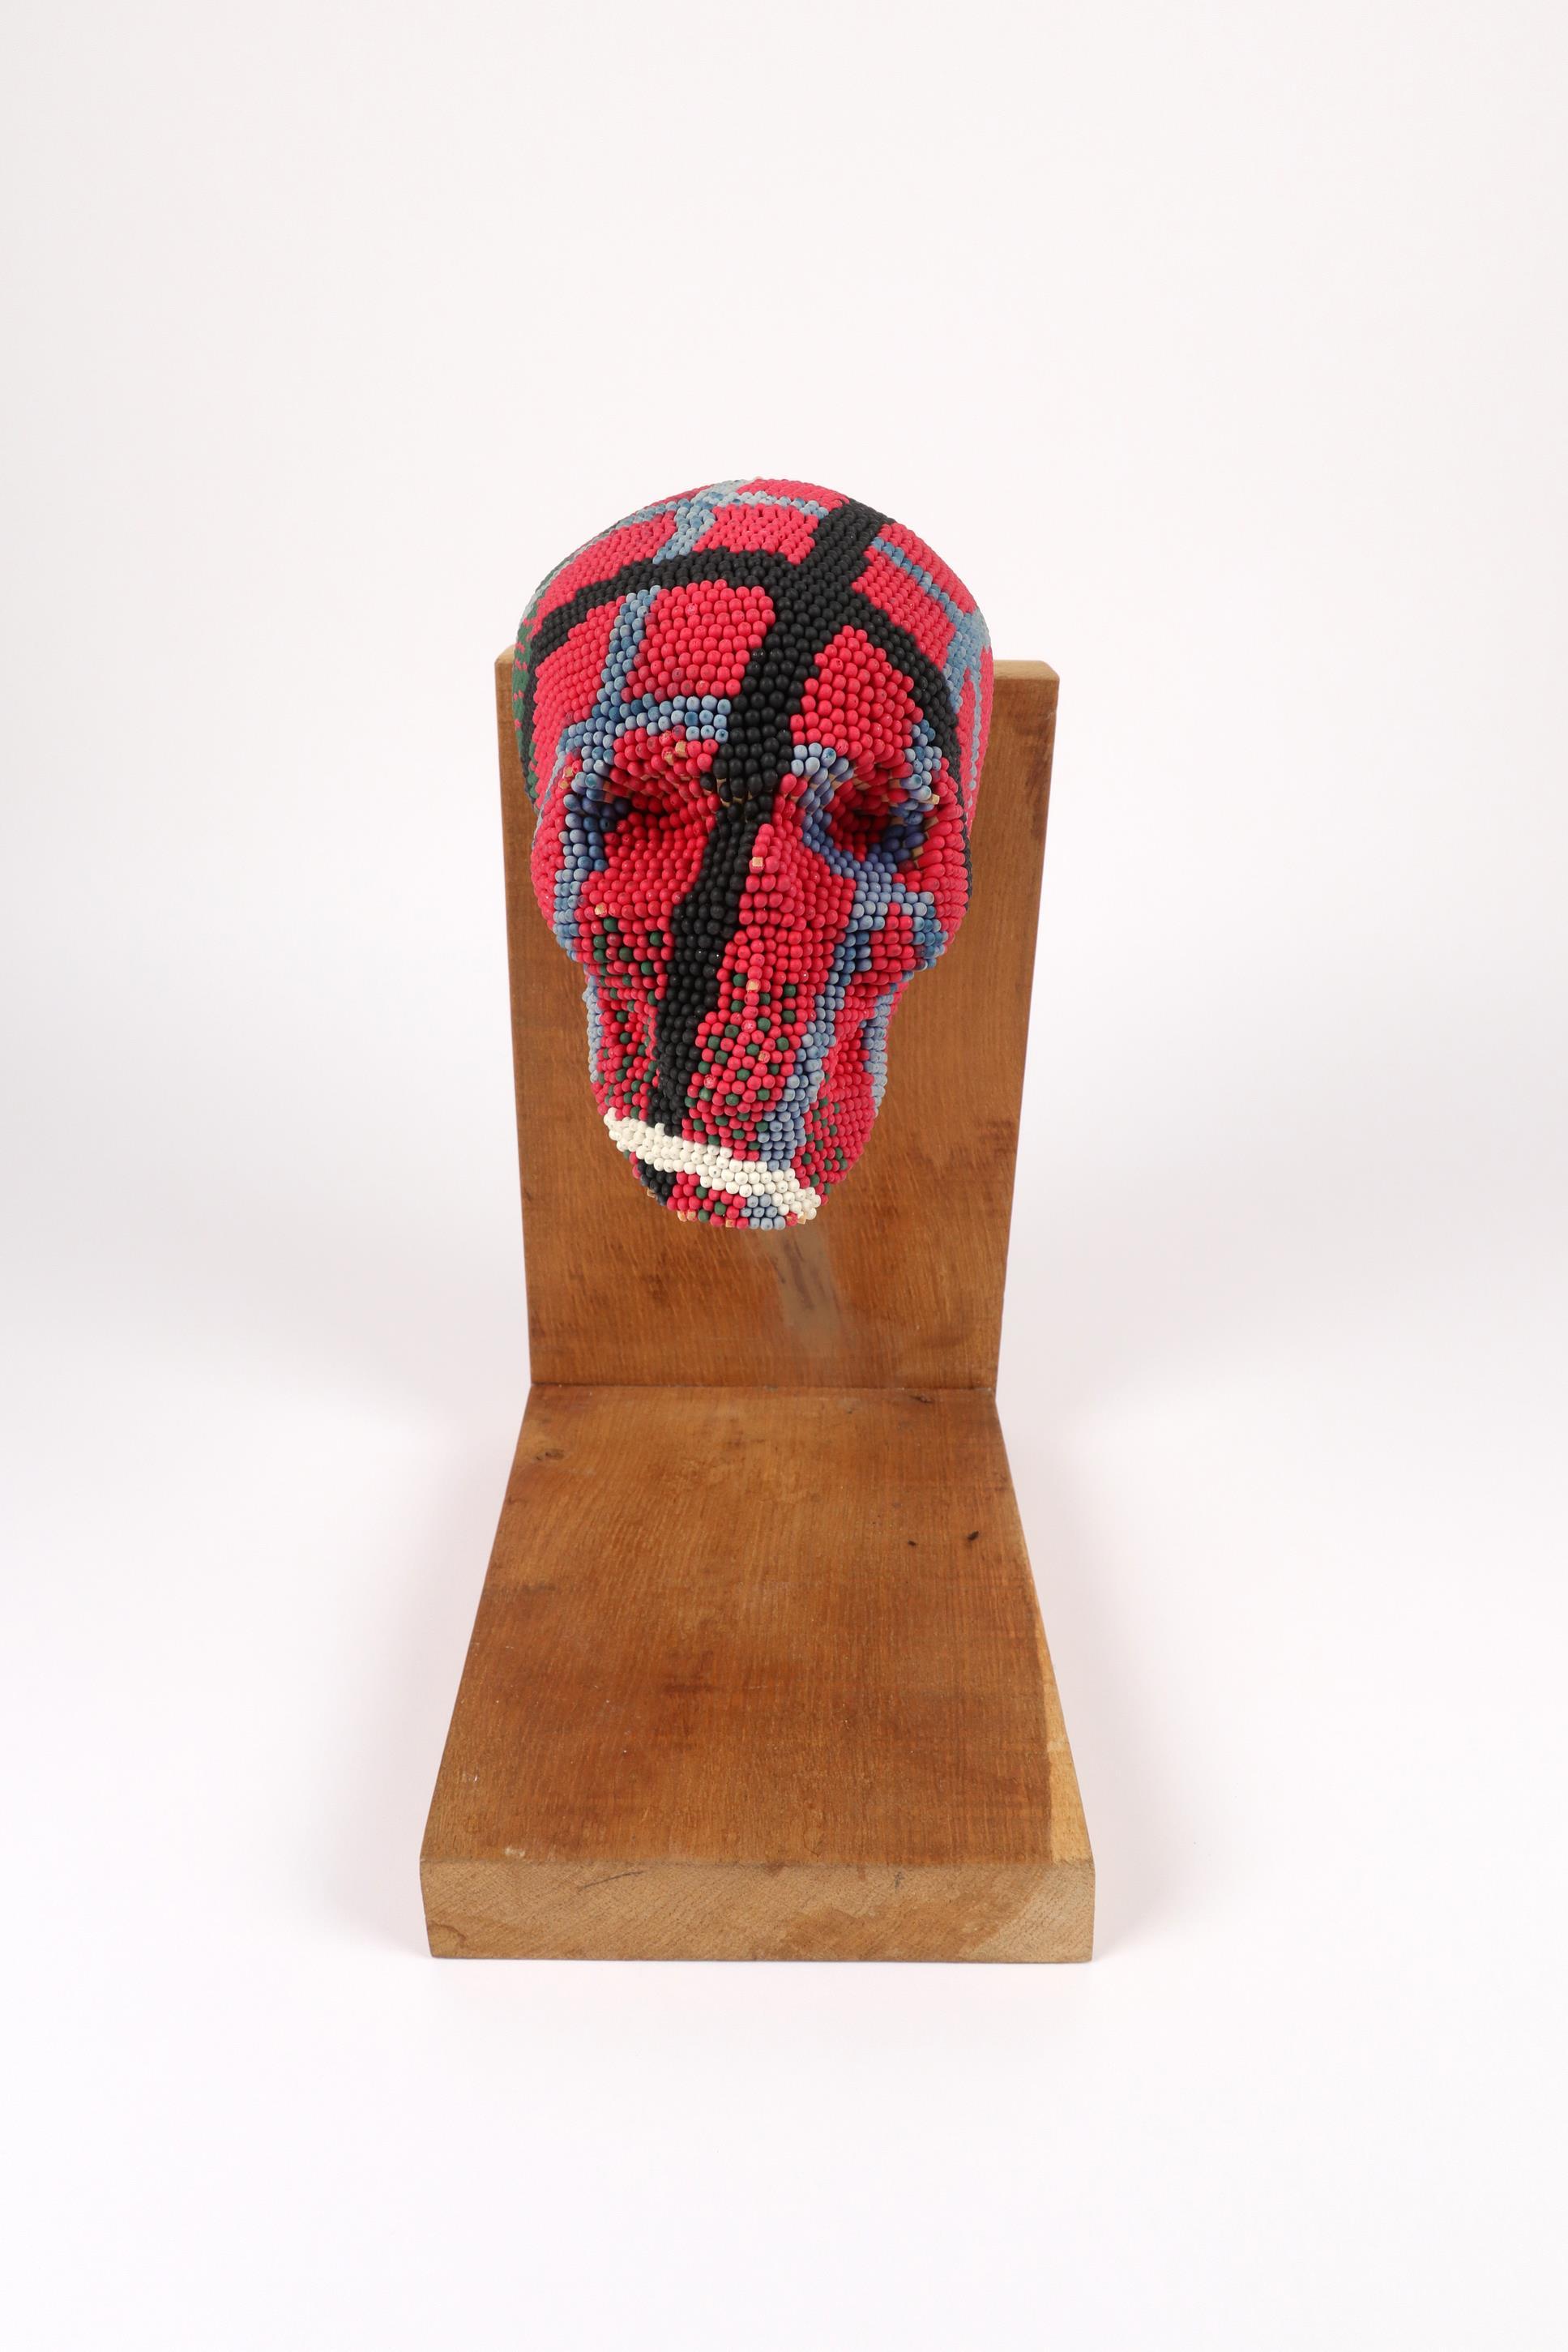 ‡David Mach RA (Scottish b.1956) Skull Signed Mach 98/No. 10/12 (to label underneath chin) - Image 2 of 5